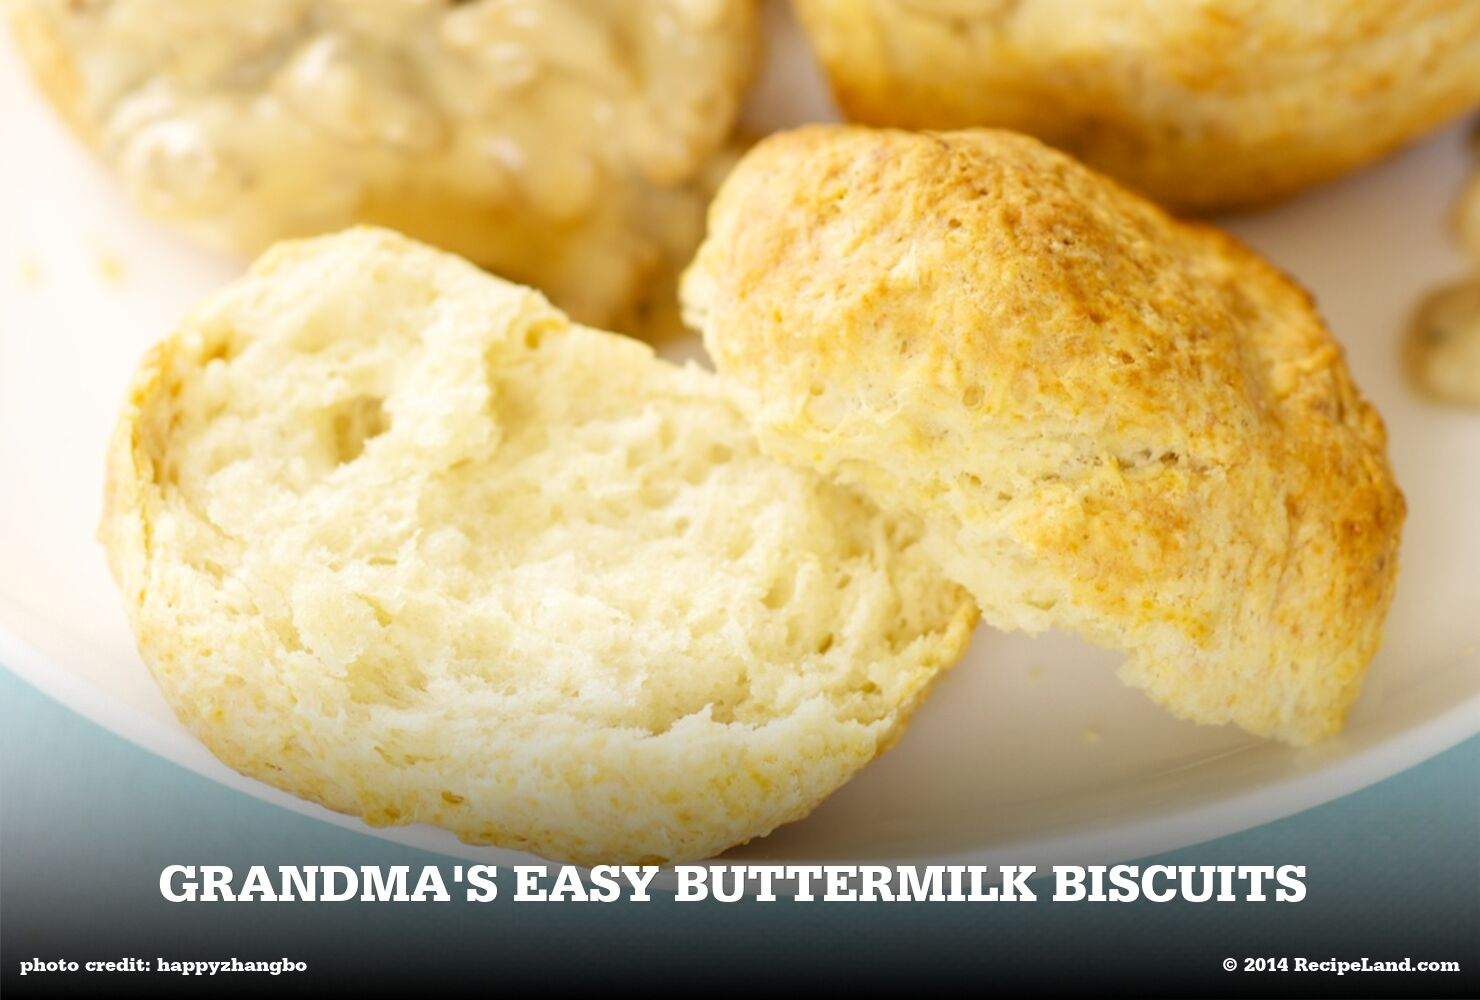 Grandma's Easy Buttermilk Biscuits